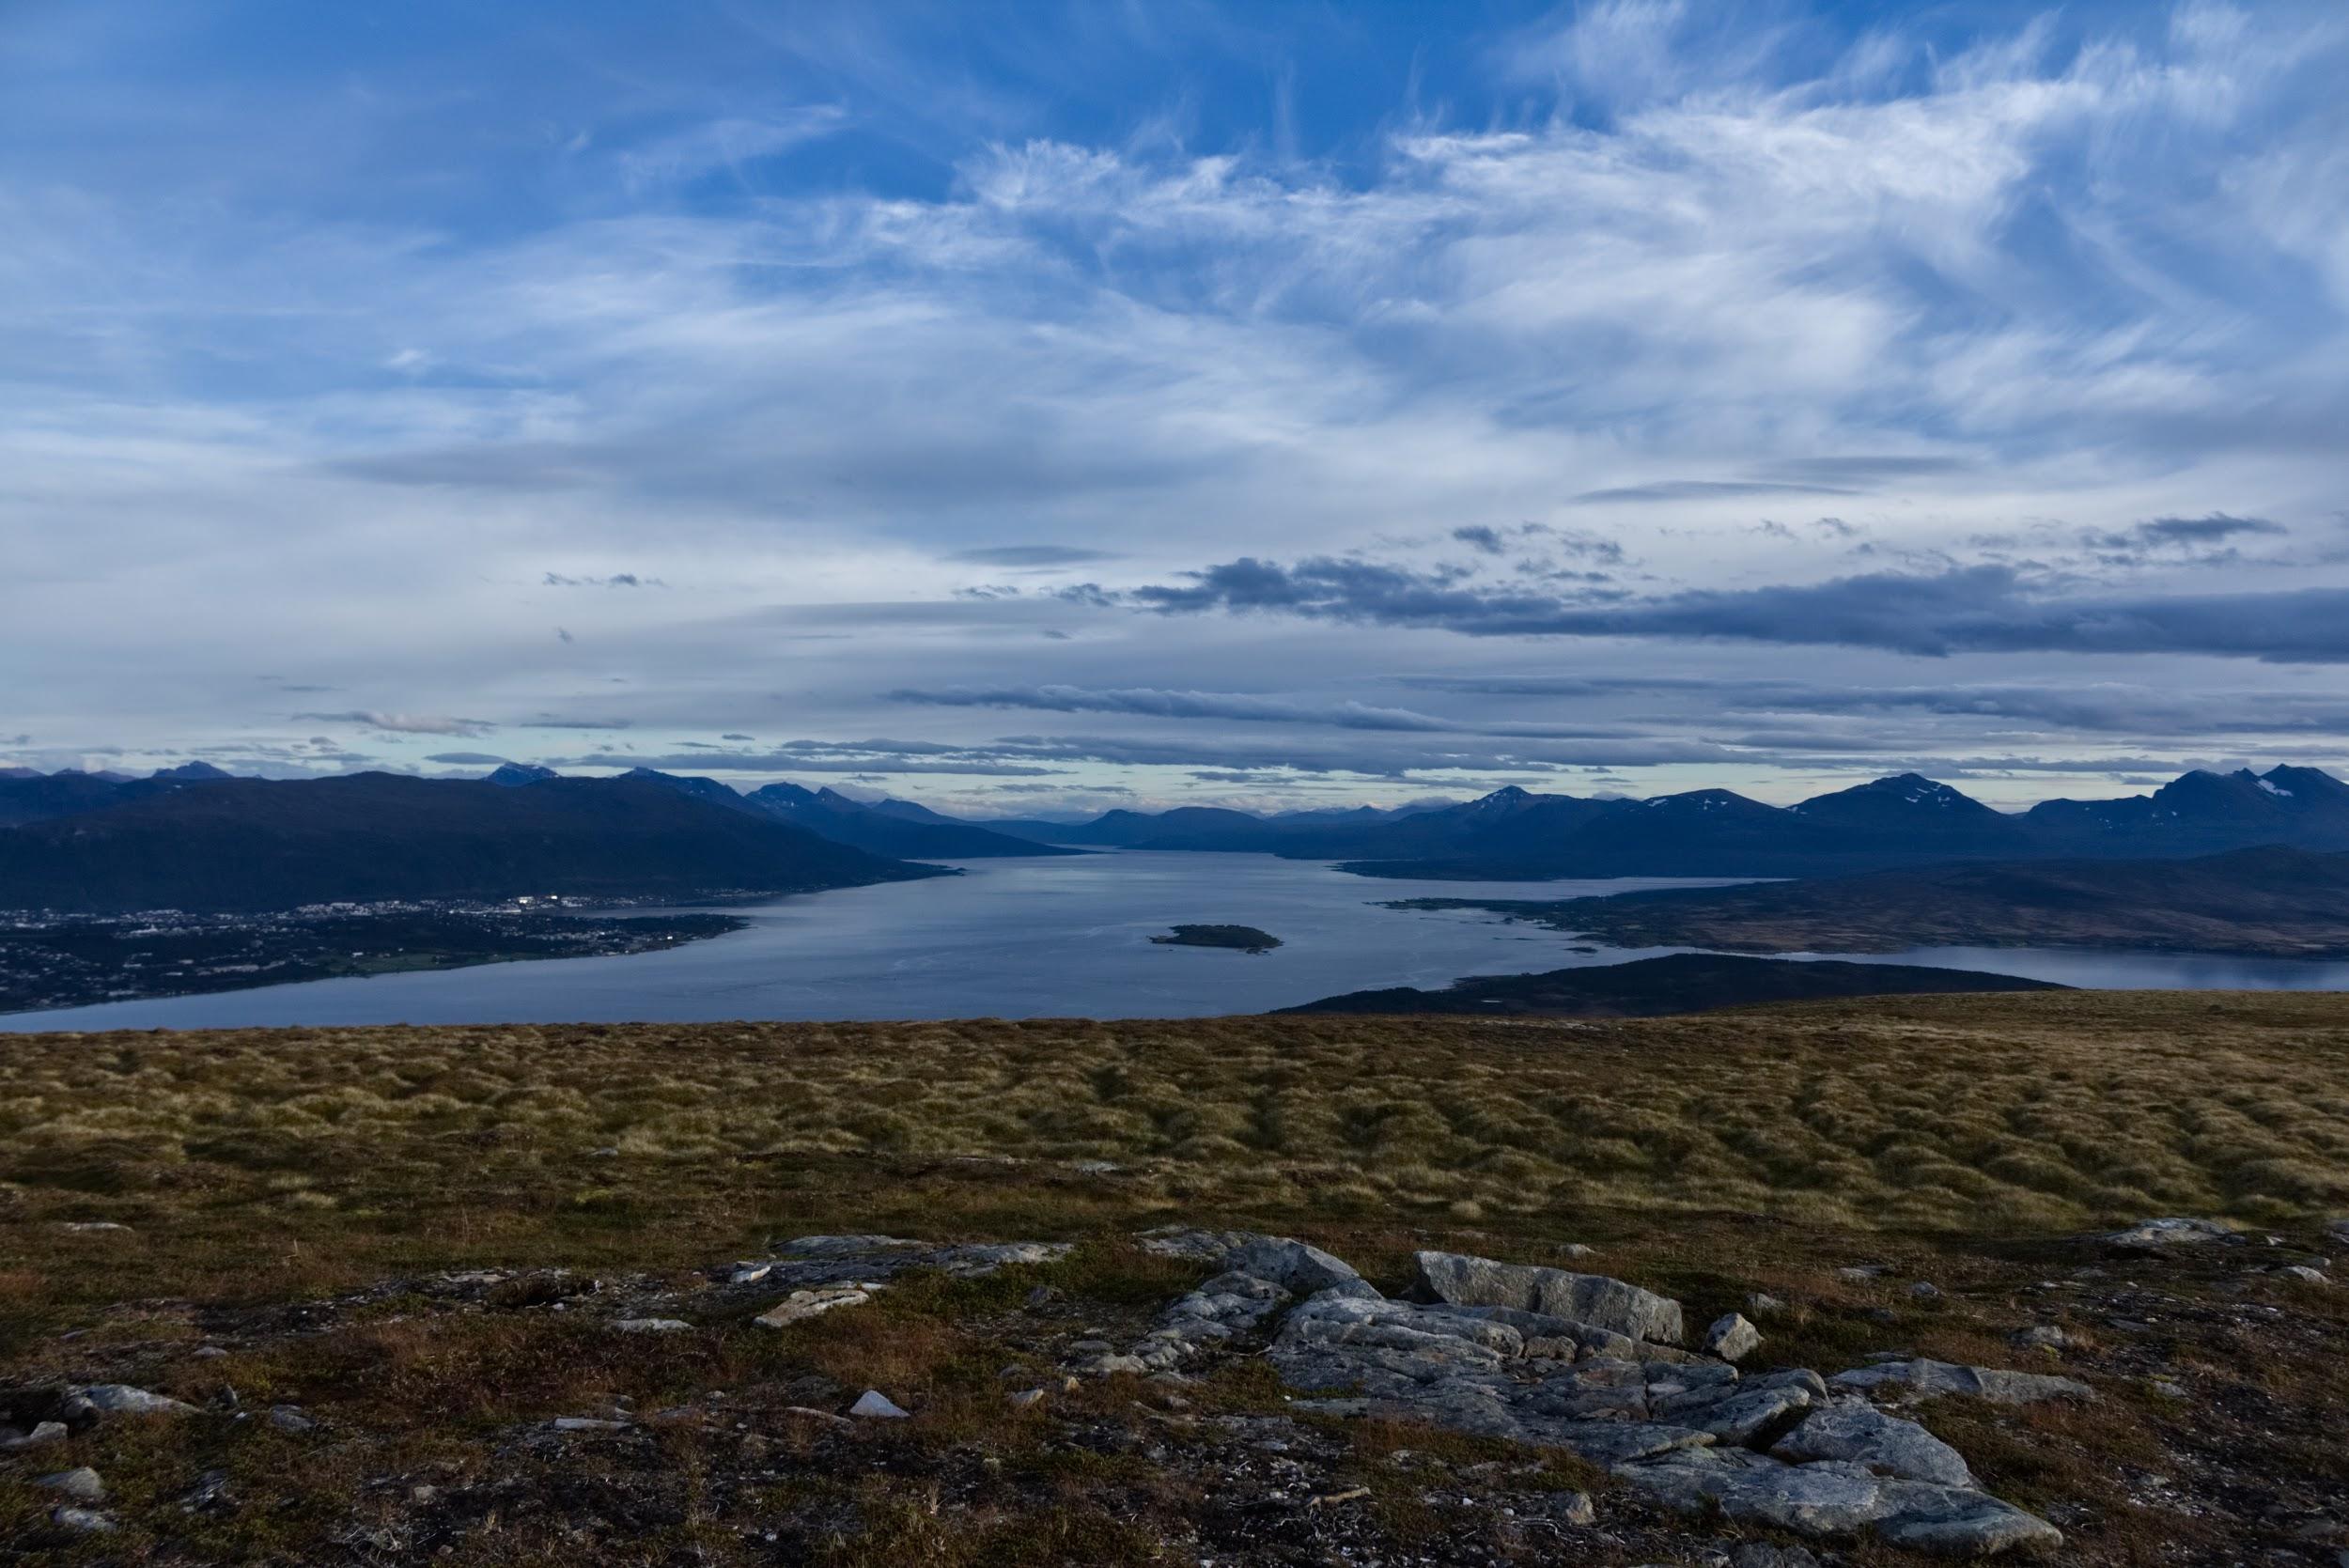 View of Romsa (Tromsø) and the surrounding landscape from the neighboring island of Sállir (Kvaløya) | Francesca Castagnetti / 2018